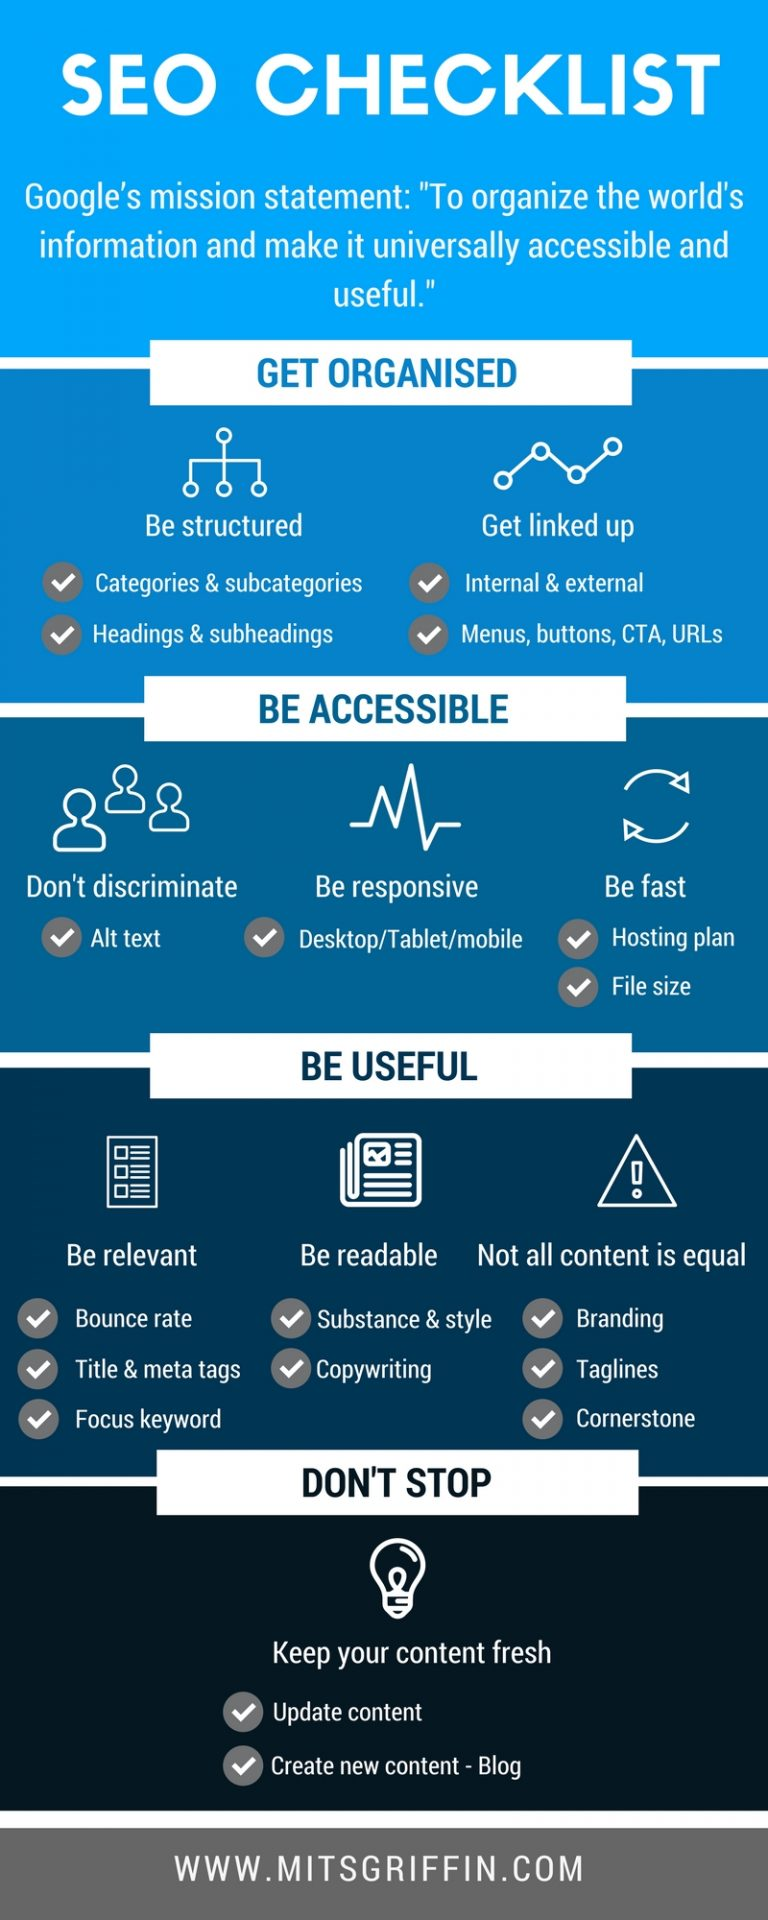 Infographic SEO checklist